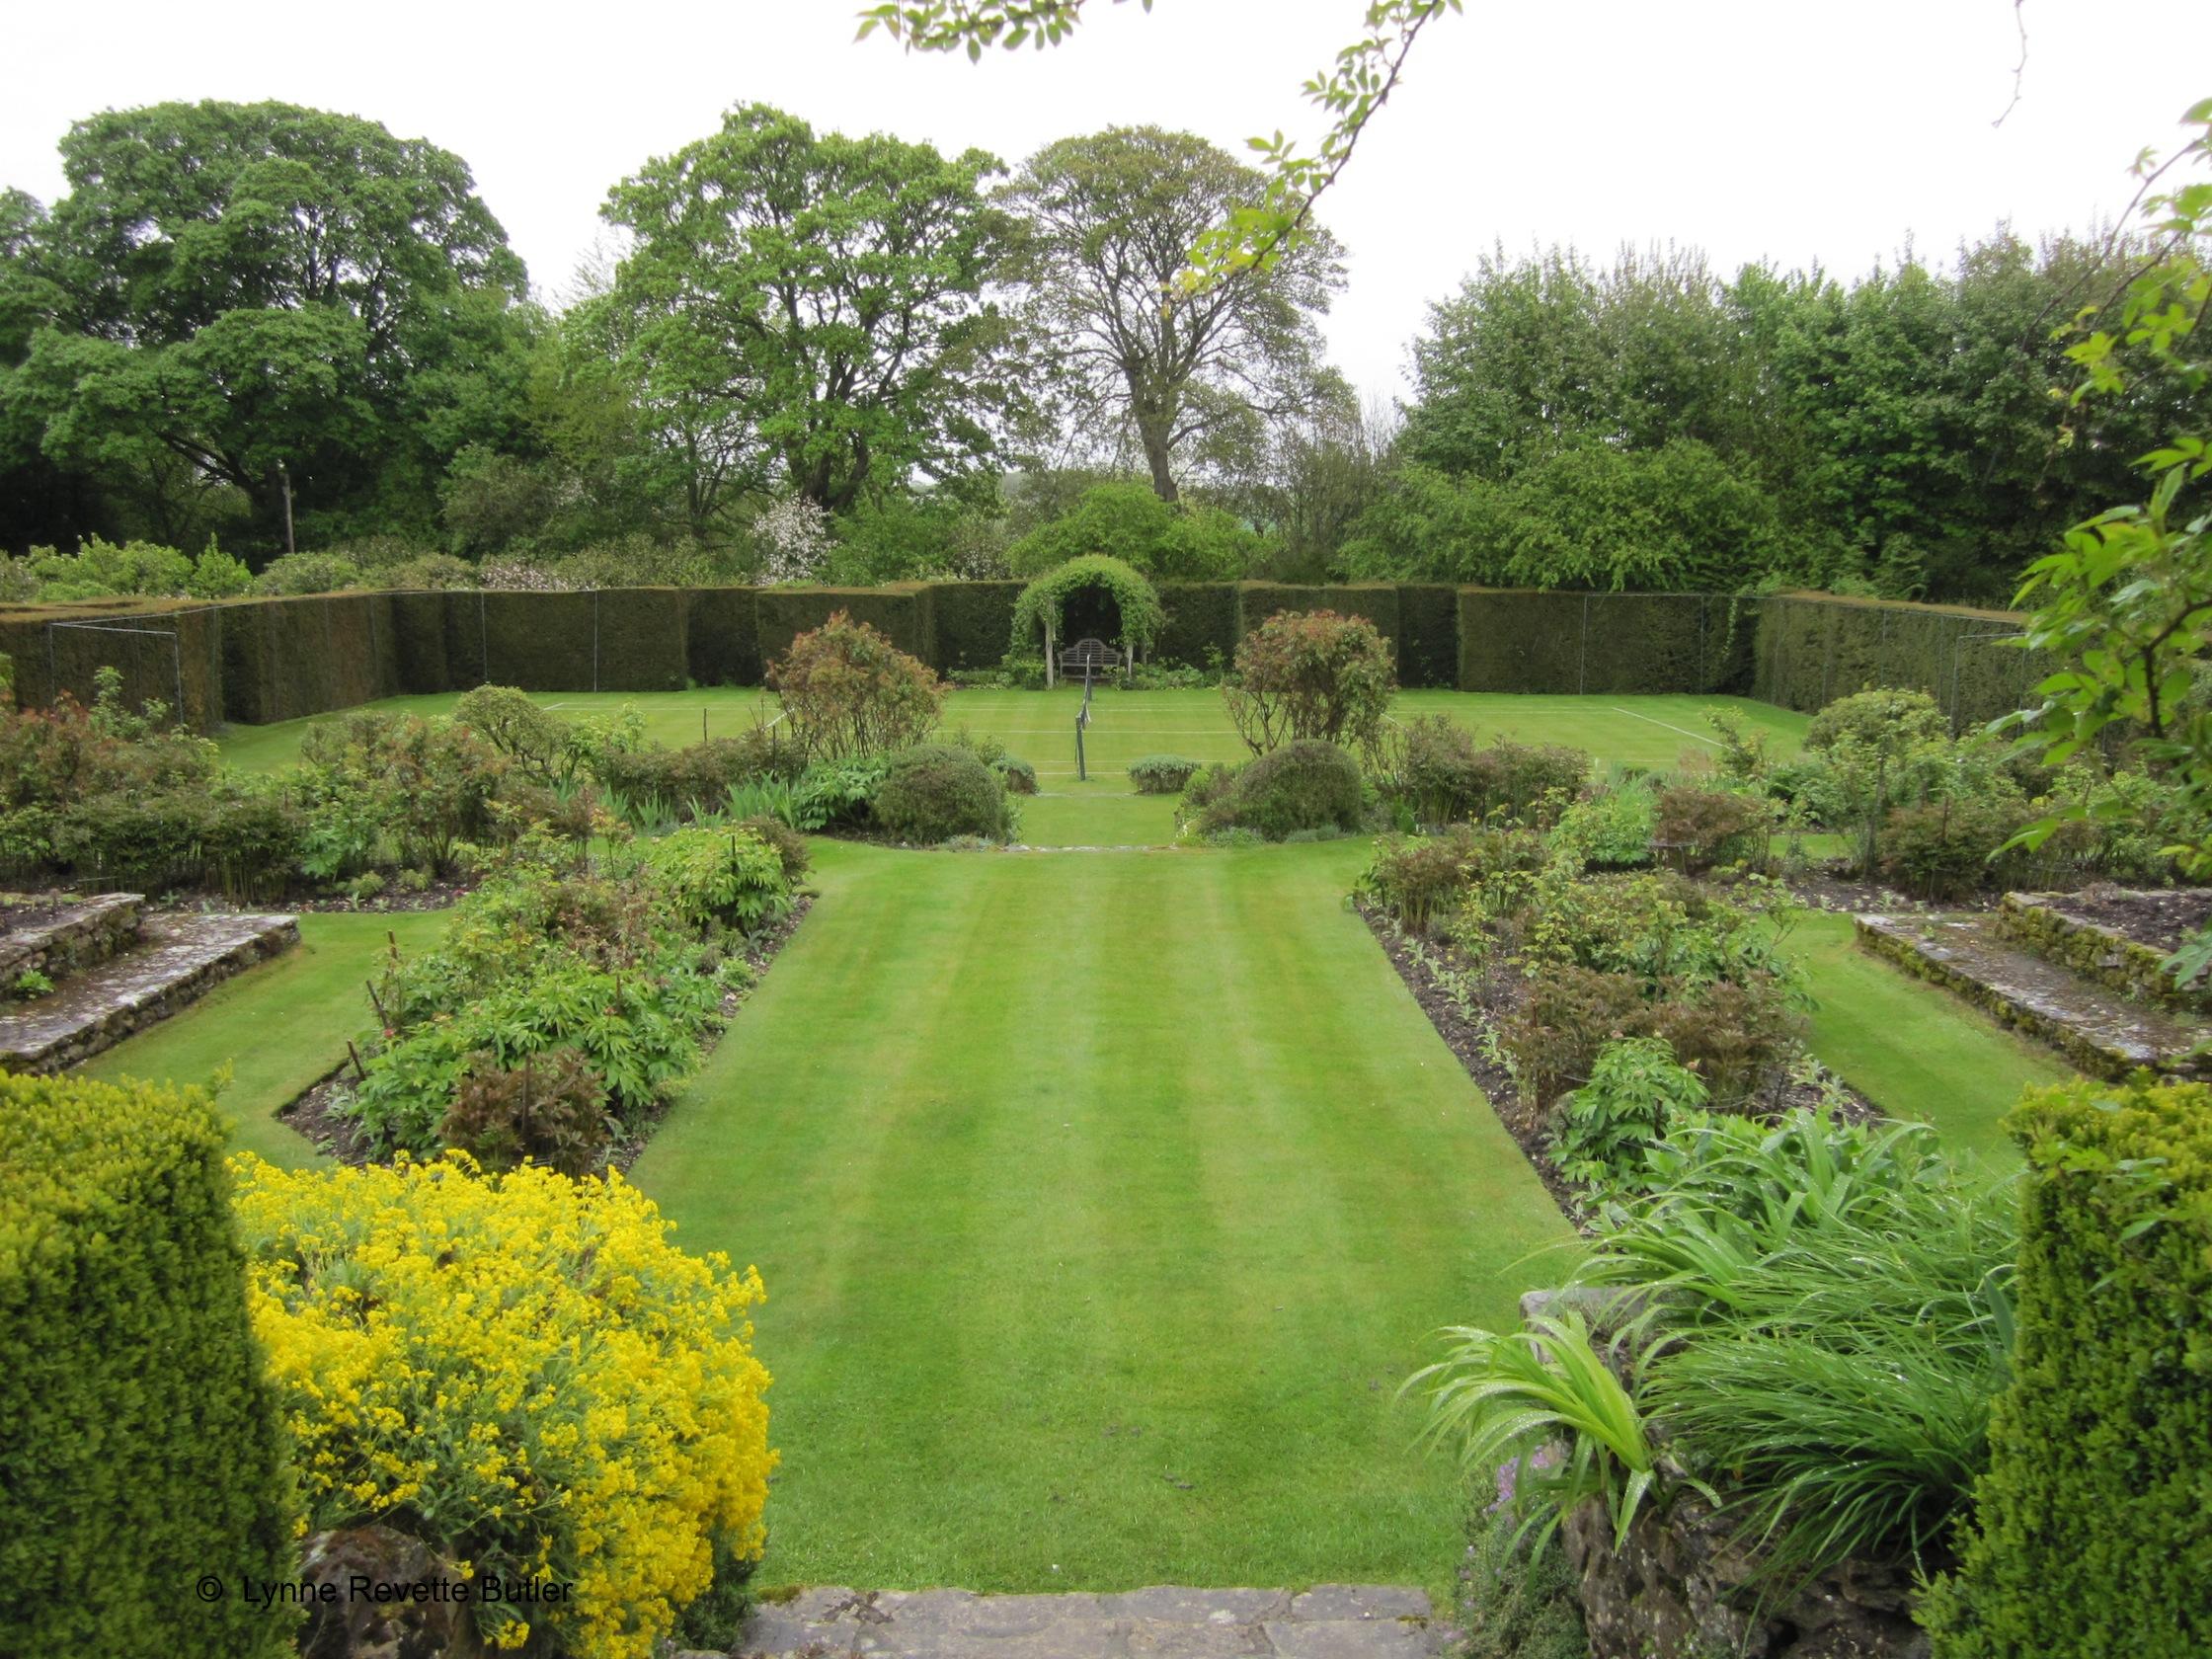 The restoration of a gertrude jekyll garden for Gertrude jekyll garden designs